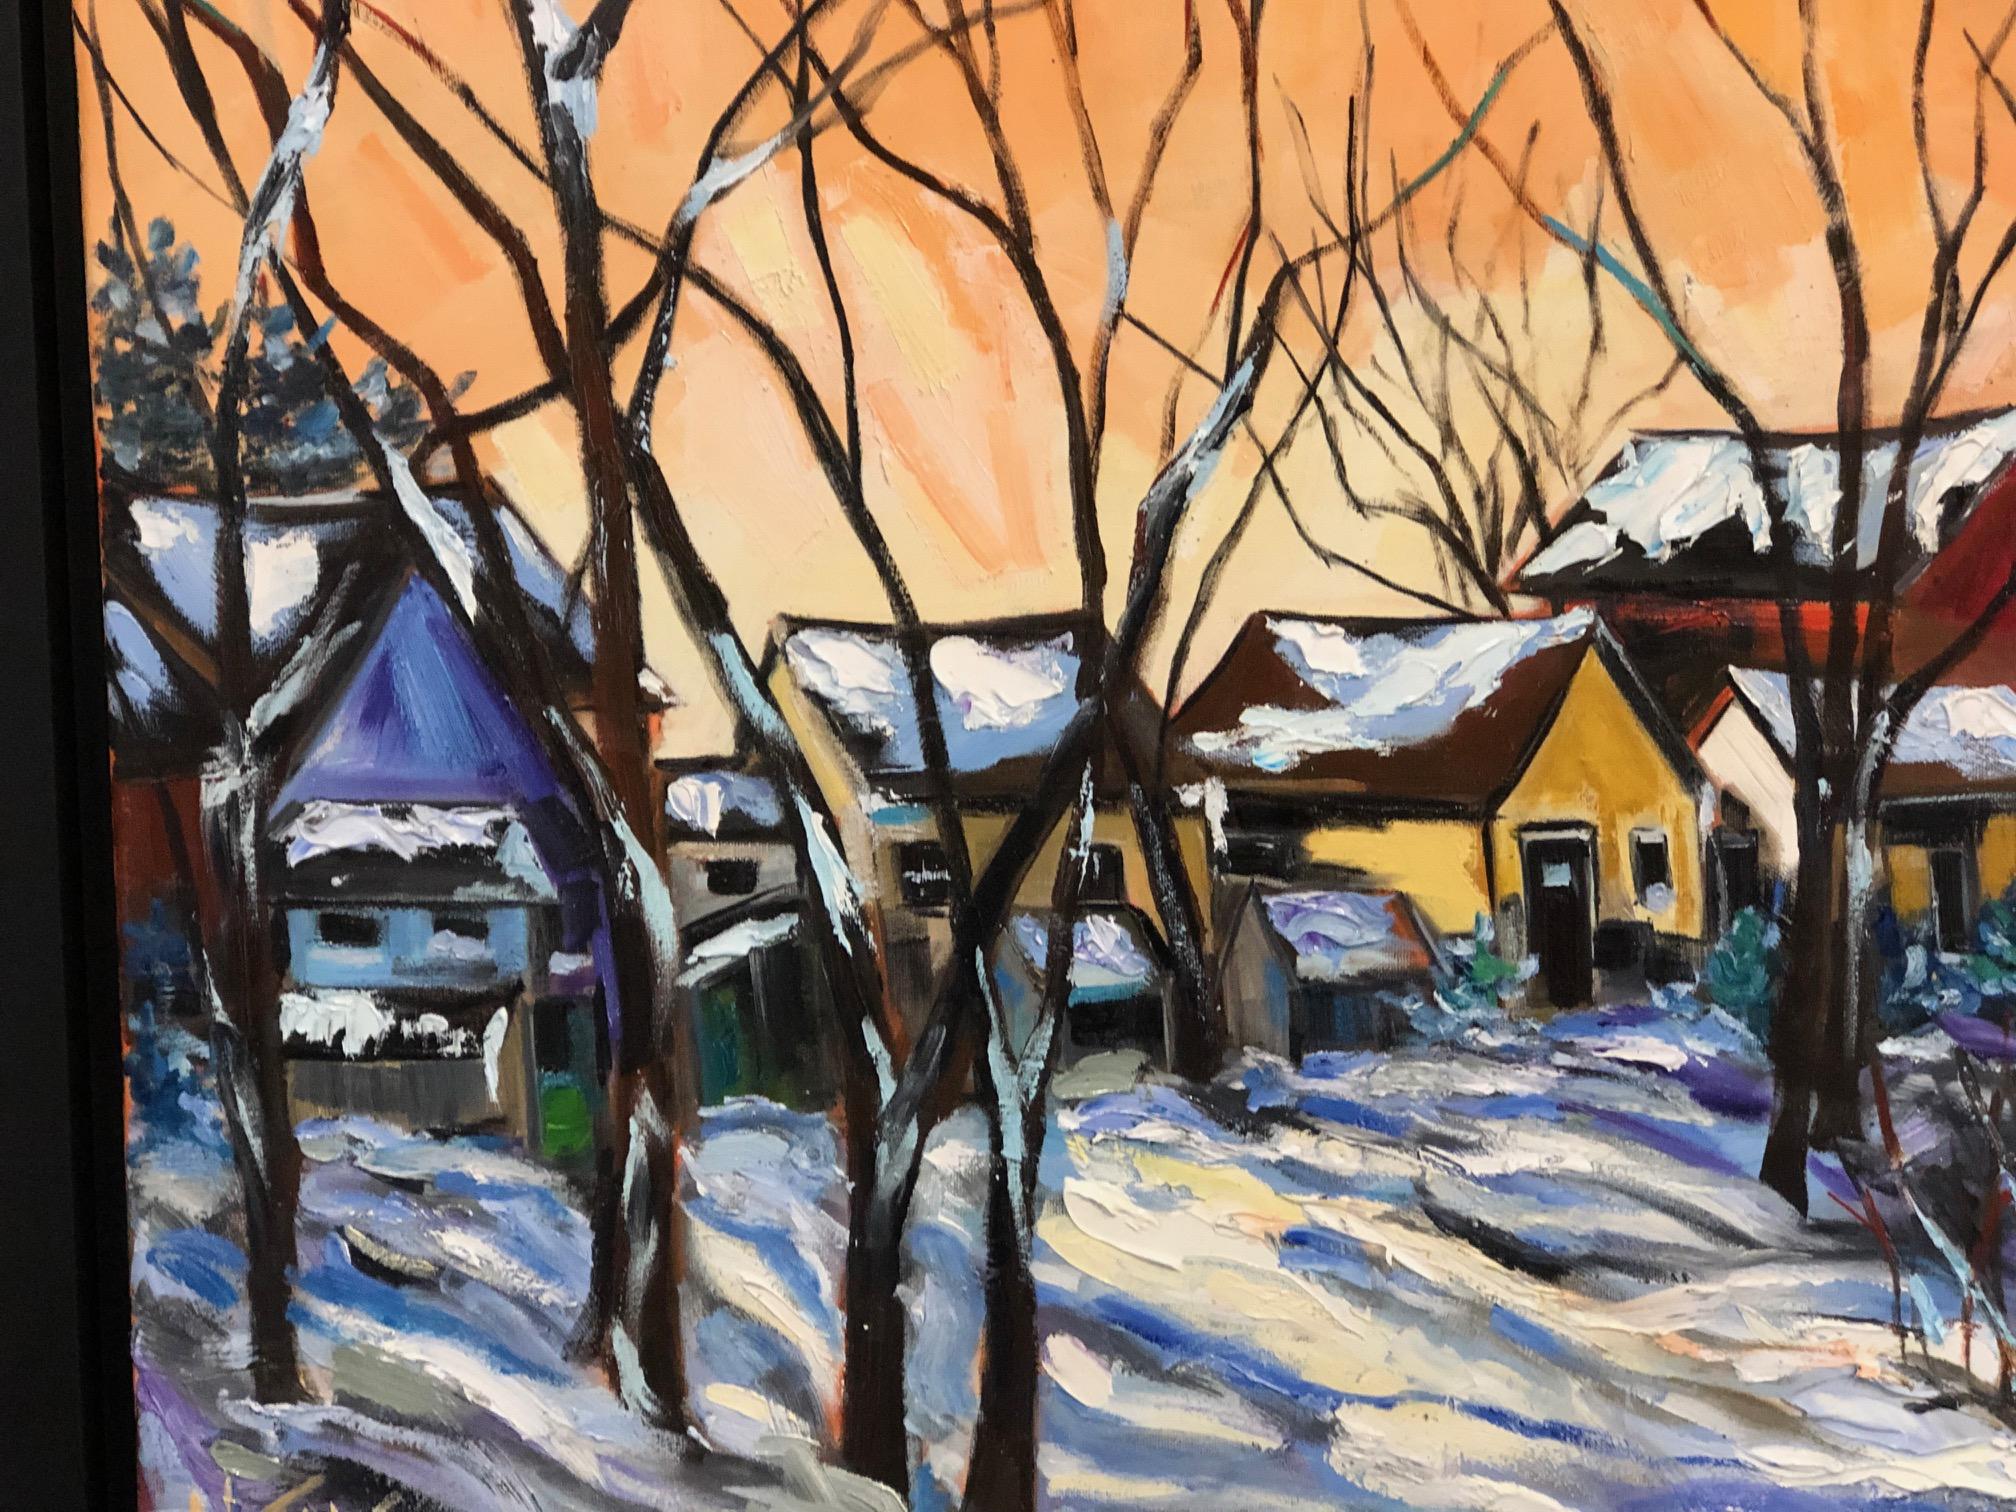 Backyard Winter - $1500.00